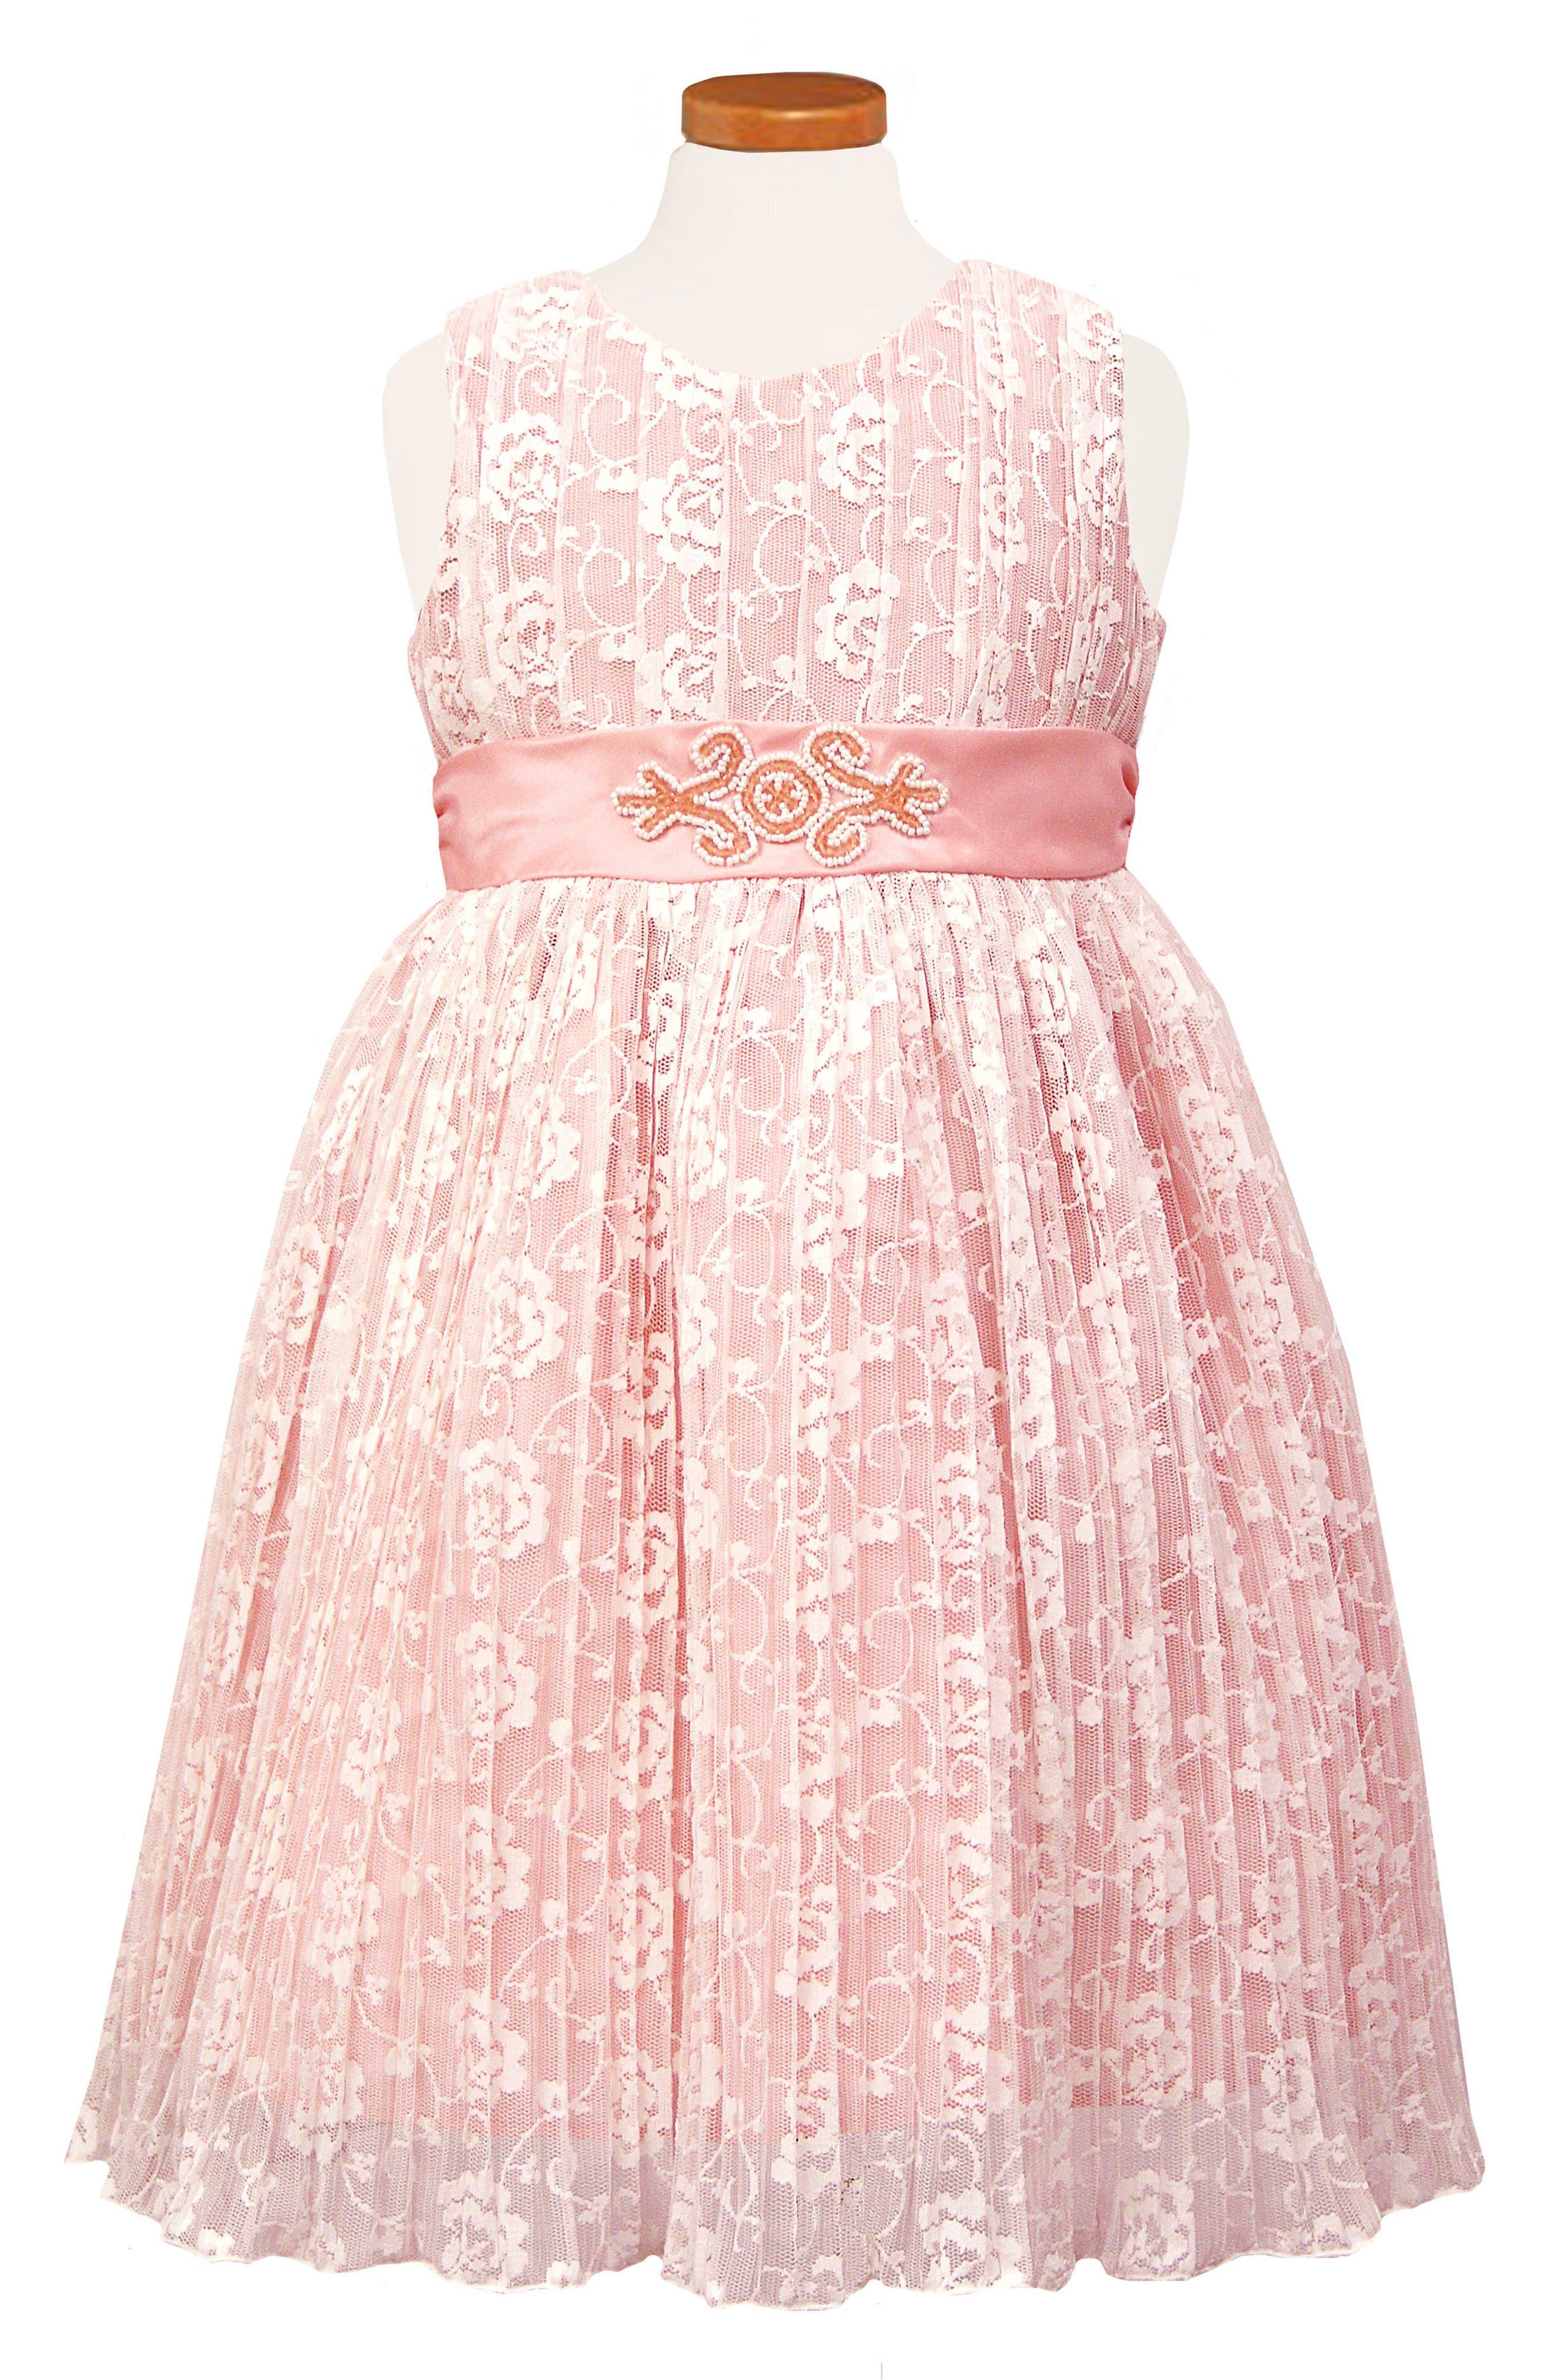 Pleat Lace Party Dress,                             Main thumbnail 1, color,                             Pink